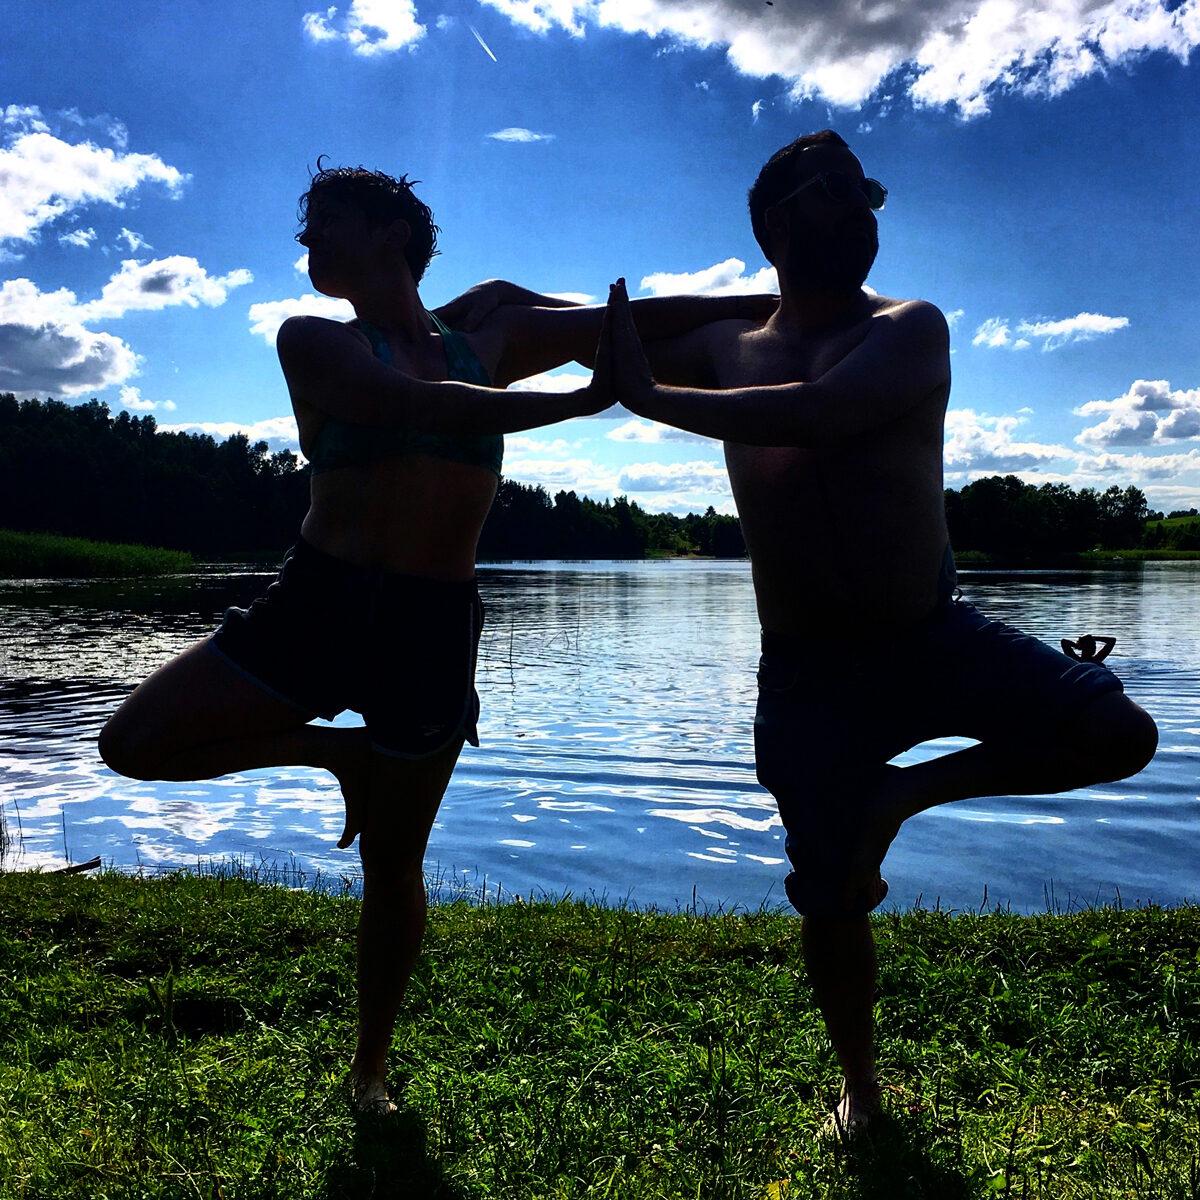 "<p>Alexx Shilling and Rob Adler Peckerar on Boksze Lake, Poland, July <span class=""numbers"">2017</span>. Photo: Lydia&nbsp;Ivanovic.</p>"